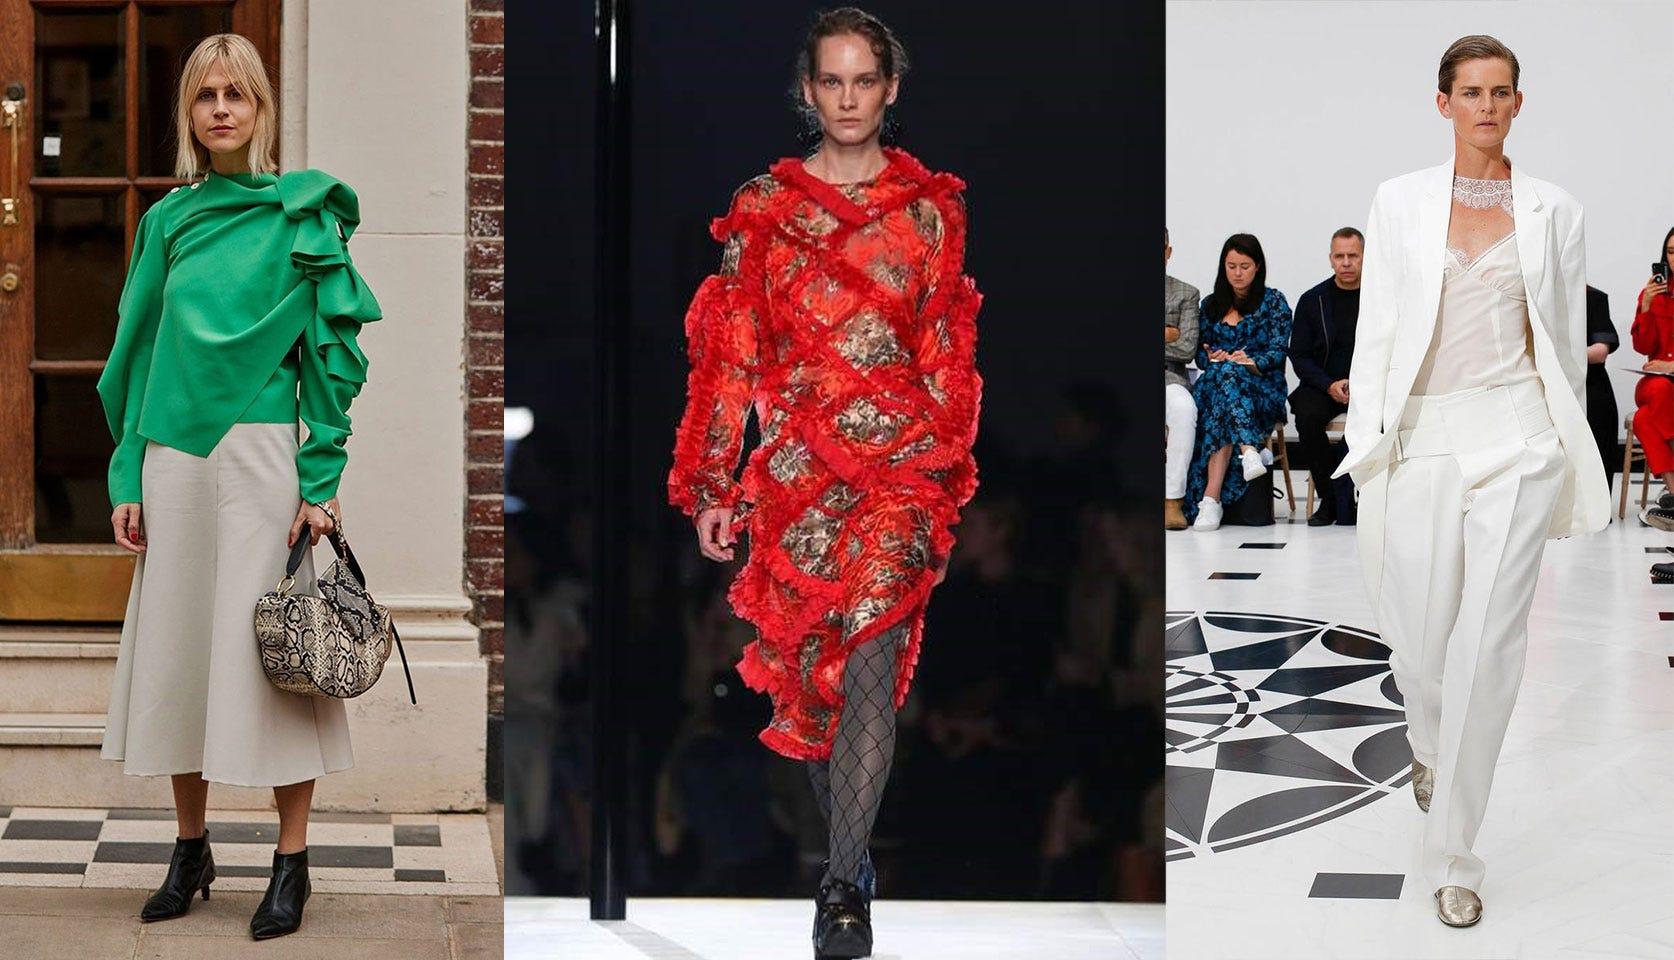 Spring/Summer 2019 Fashion Trends from London Fashion Week: 'Strawberries & Cream'